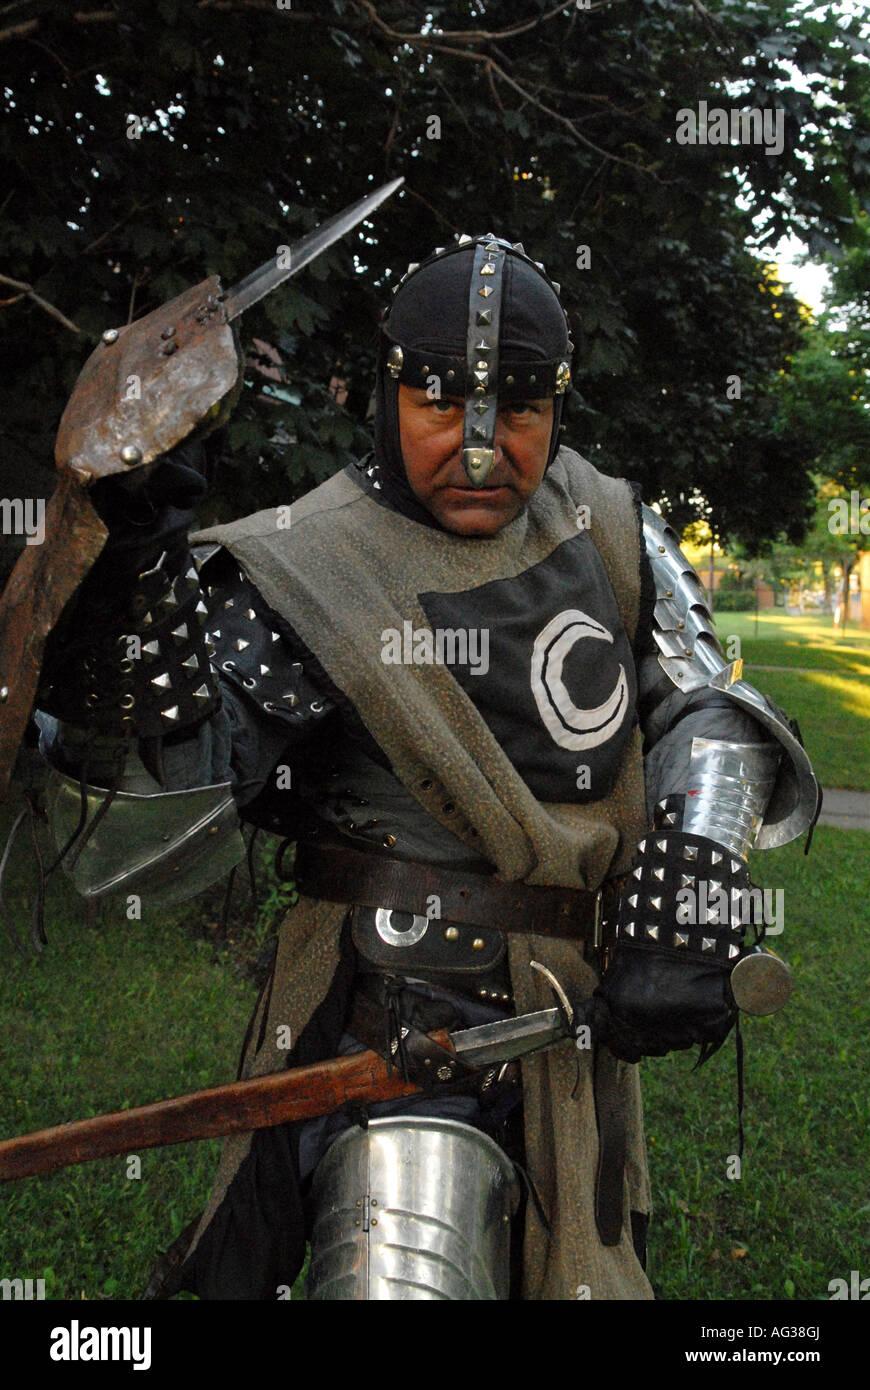 Cavaliere in costume medievale Immagini Stock